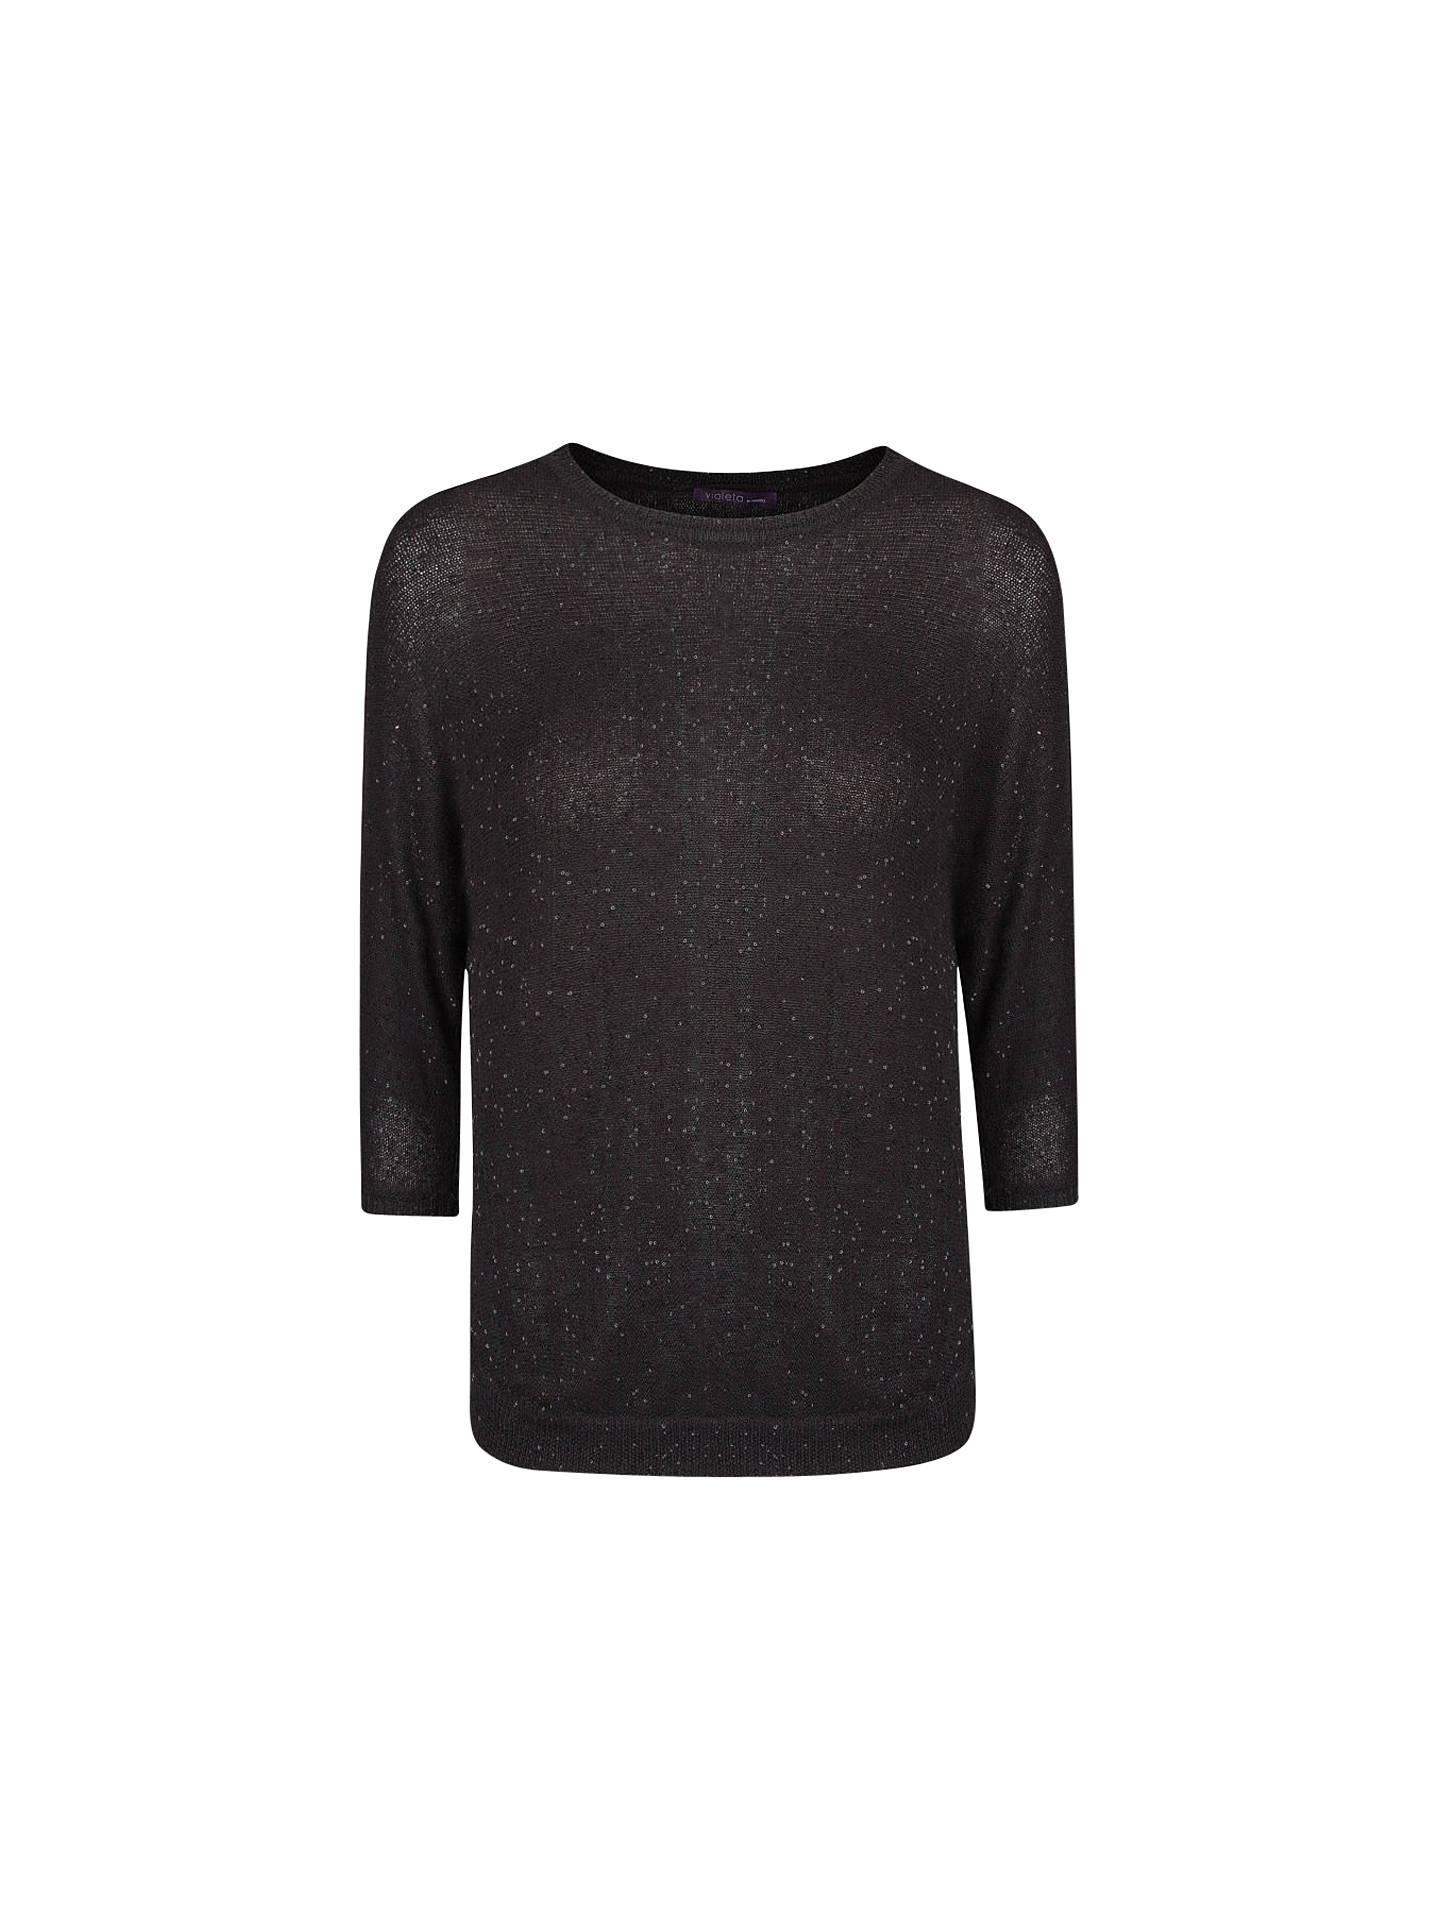 a9b5a4644 Buy Violeta by Mango Sequin Jumper, Black, S Online at johnlewis.com ...